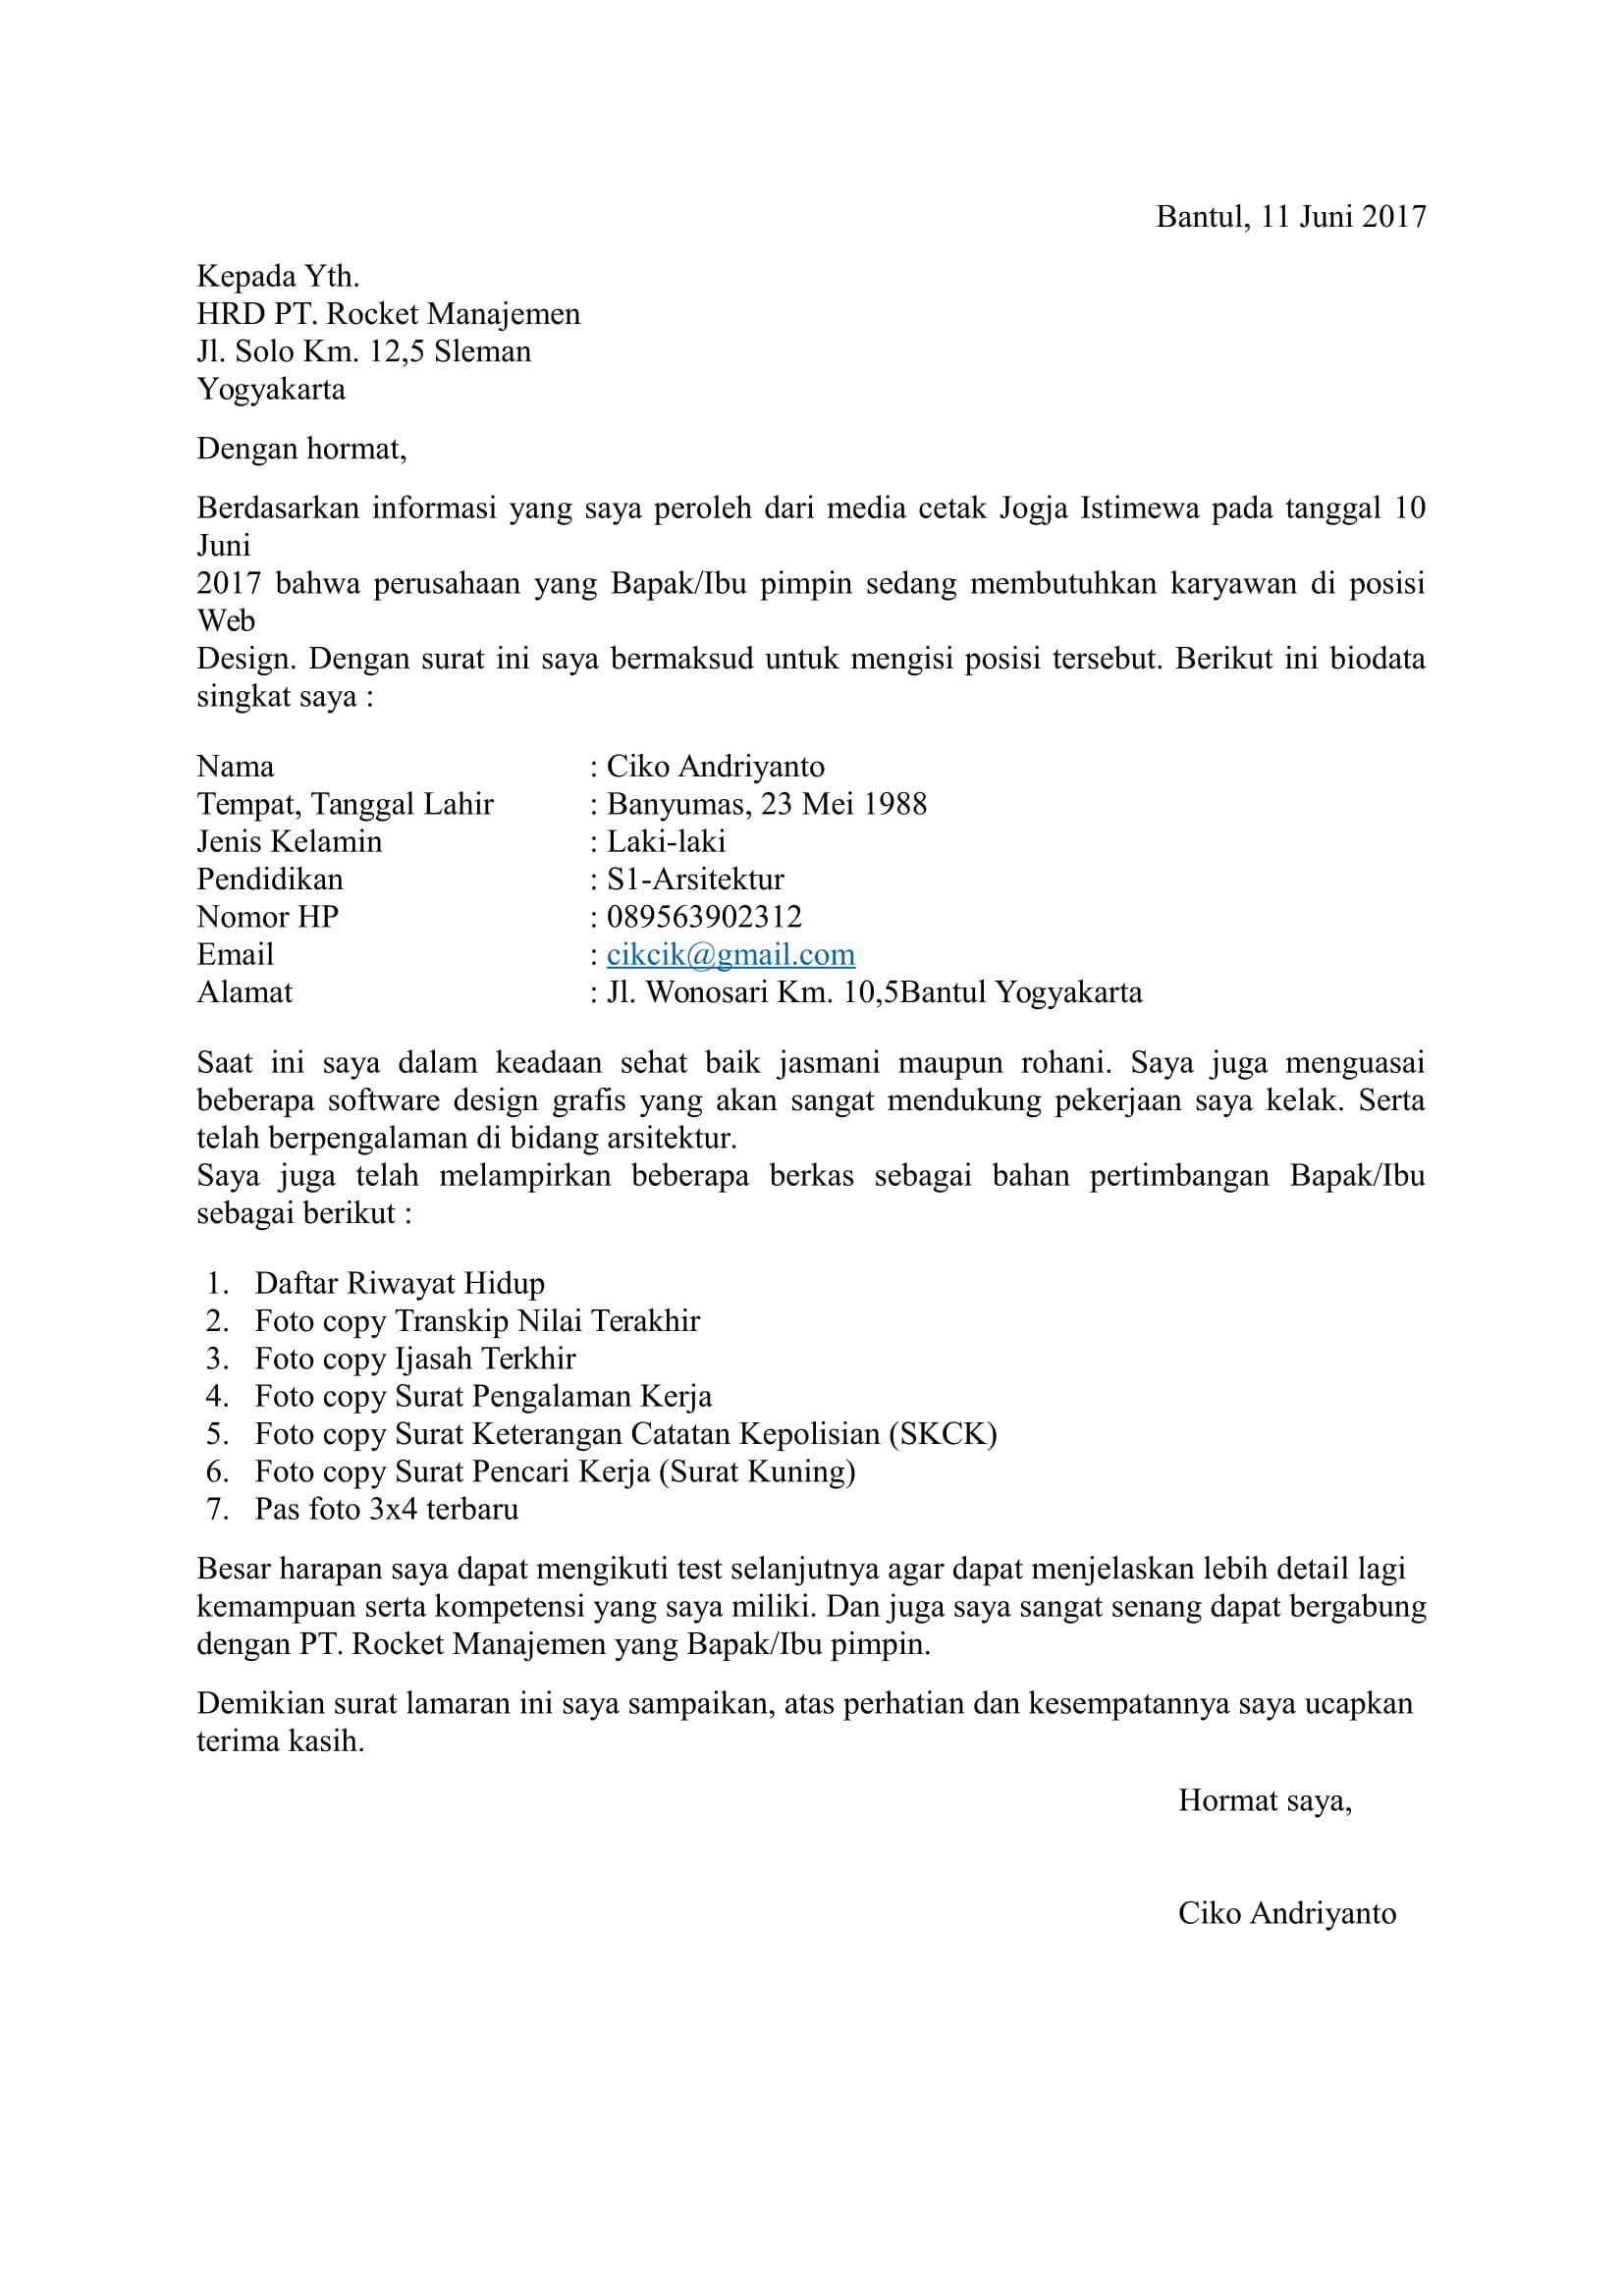 Contoh Surat Lamaran Kerja Pdf Surat Cv Kreatif Desain Cv